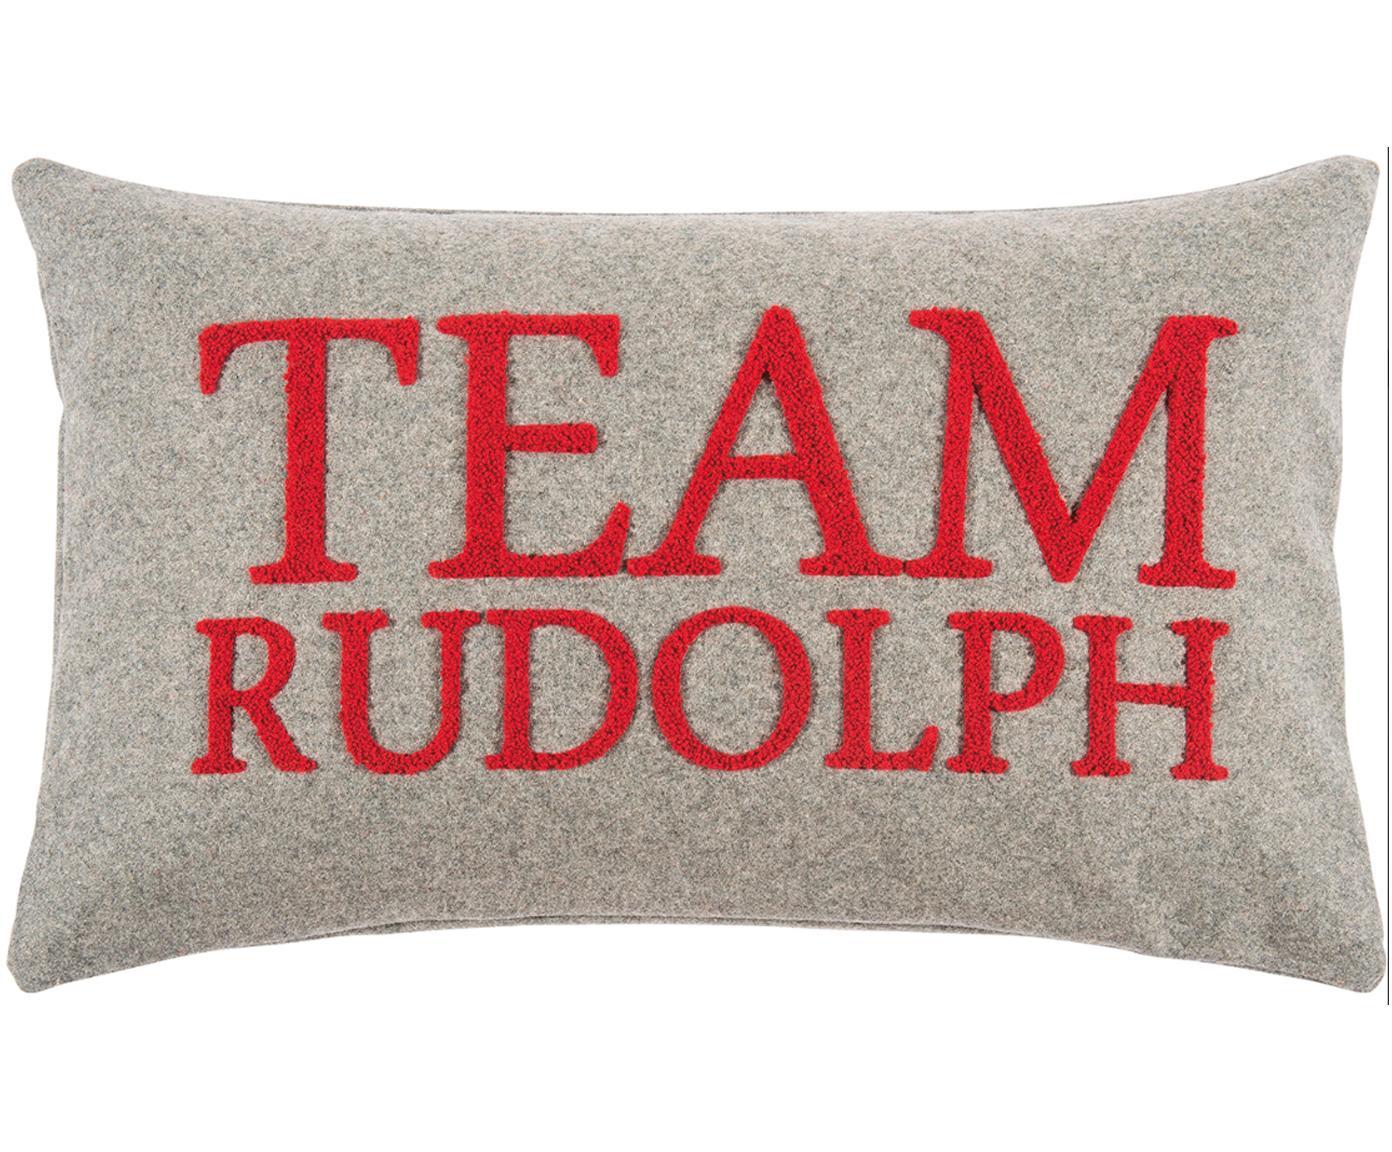 Kussenhoes Rudolph, 60% wol, 40% polyester, Lichtgrijs, rood, 30 x 50 cm